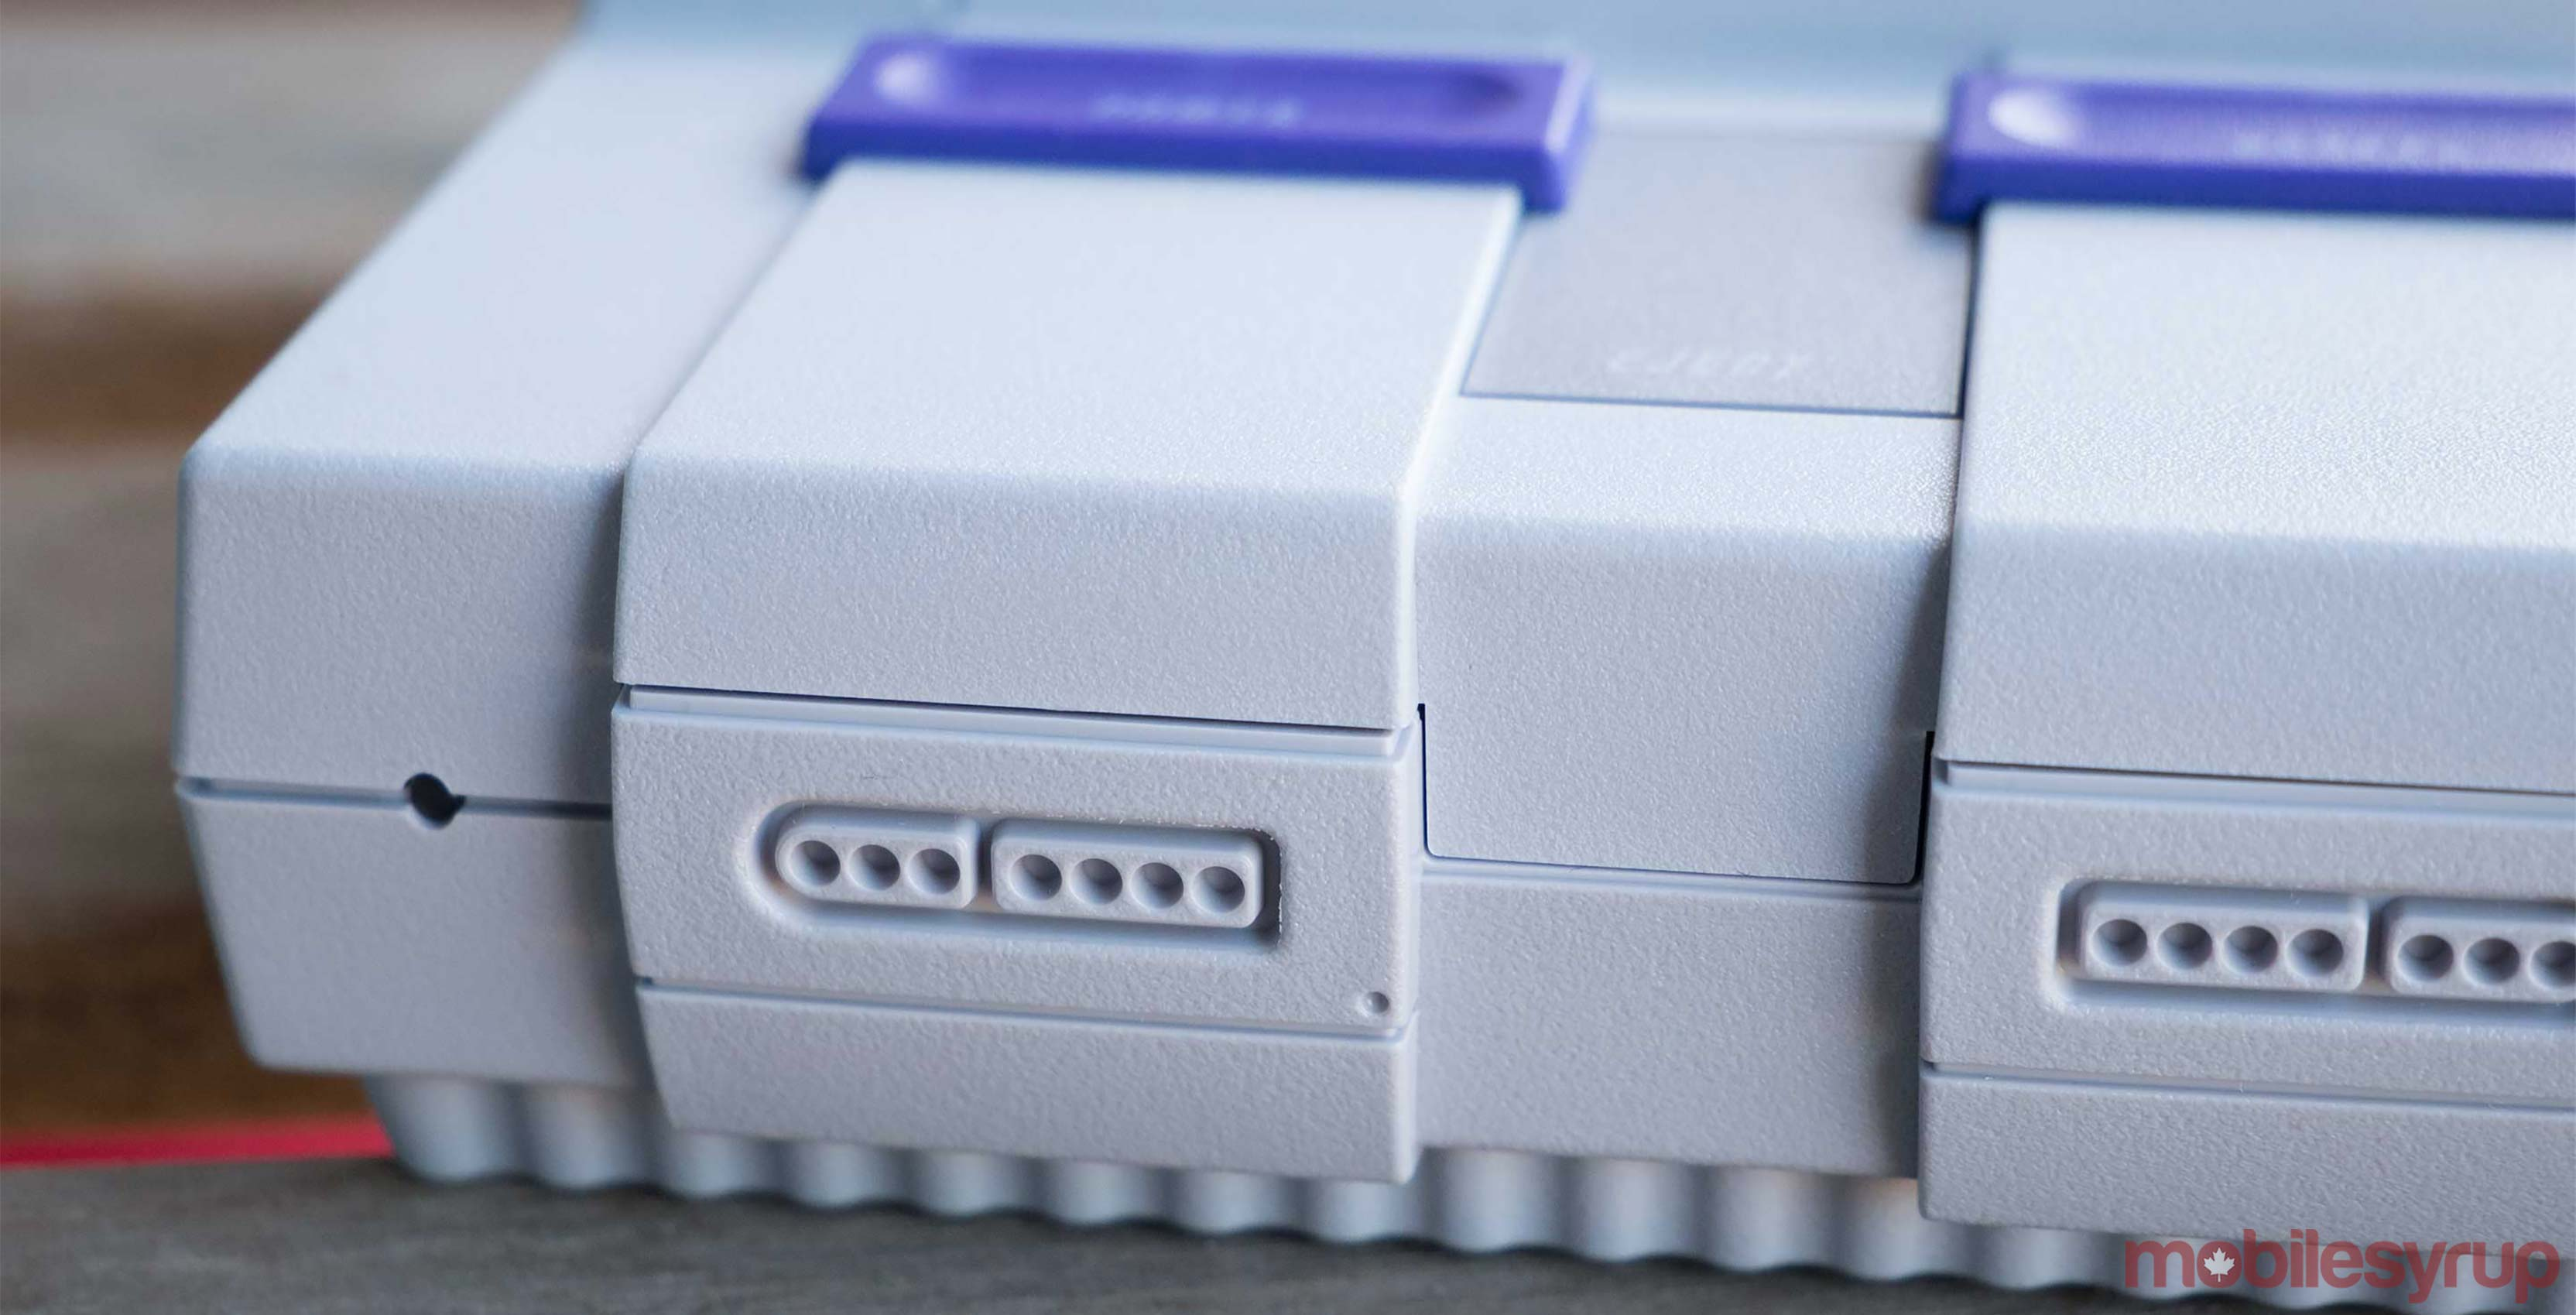 SNES Classic front close-up